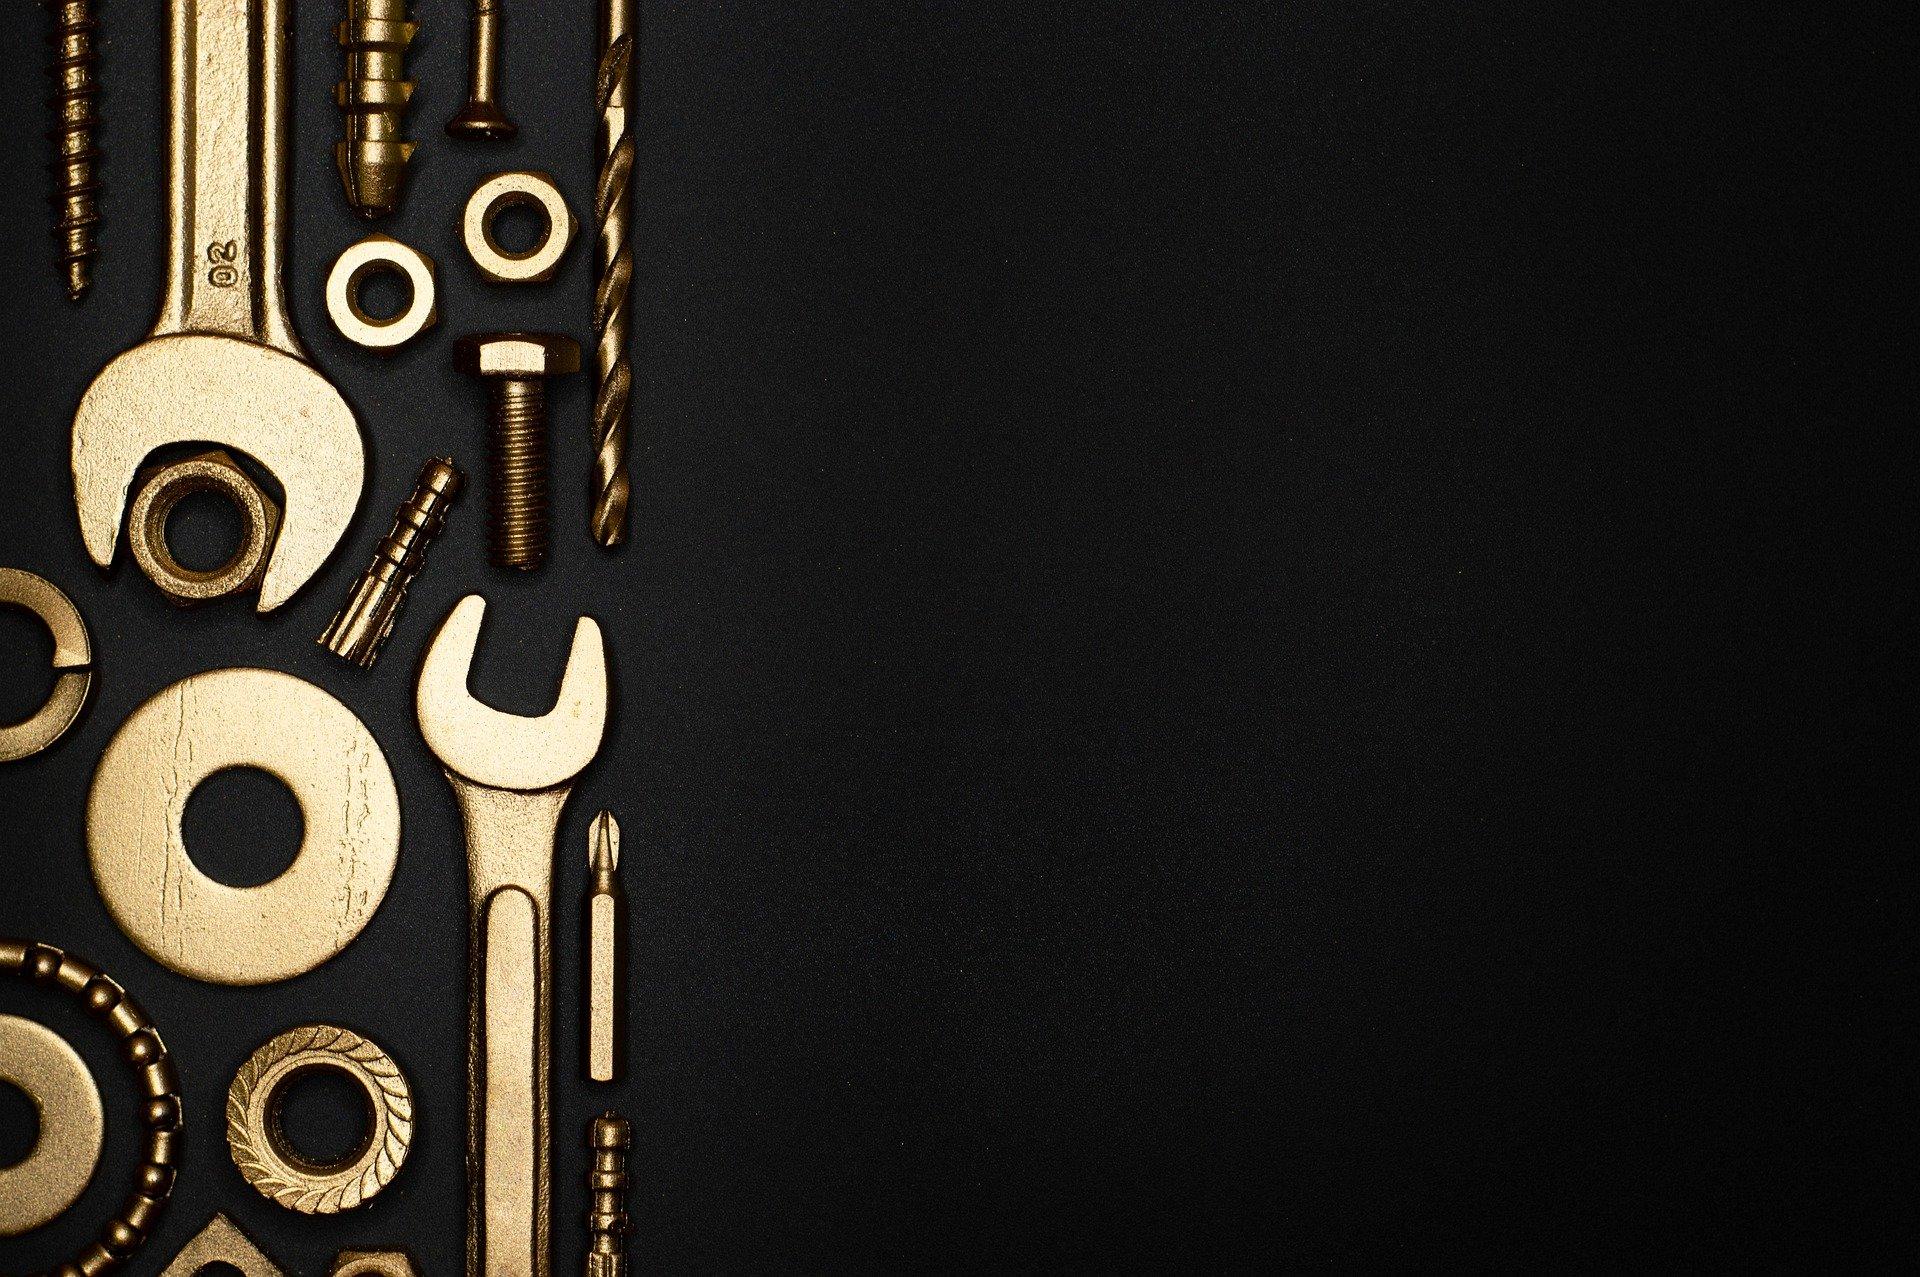 screw-4929711_1920